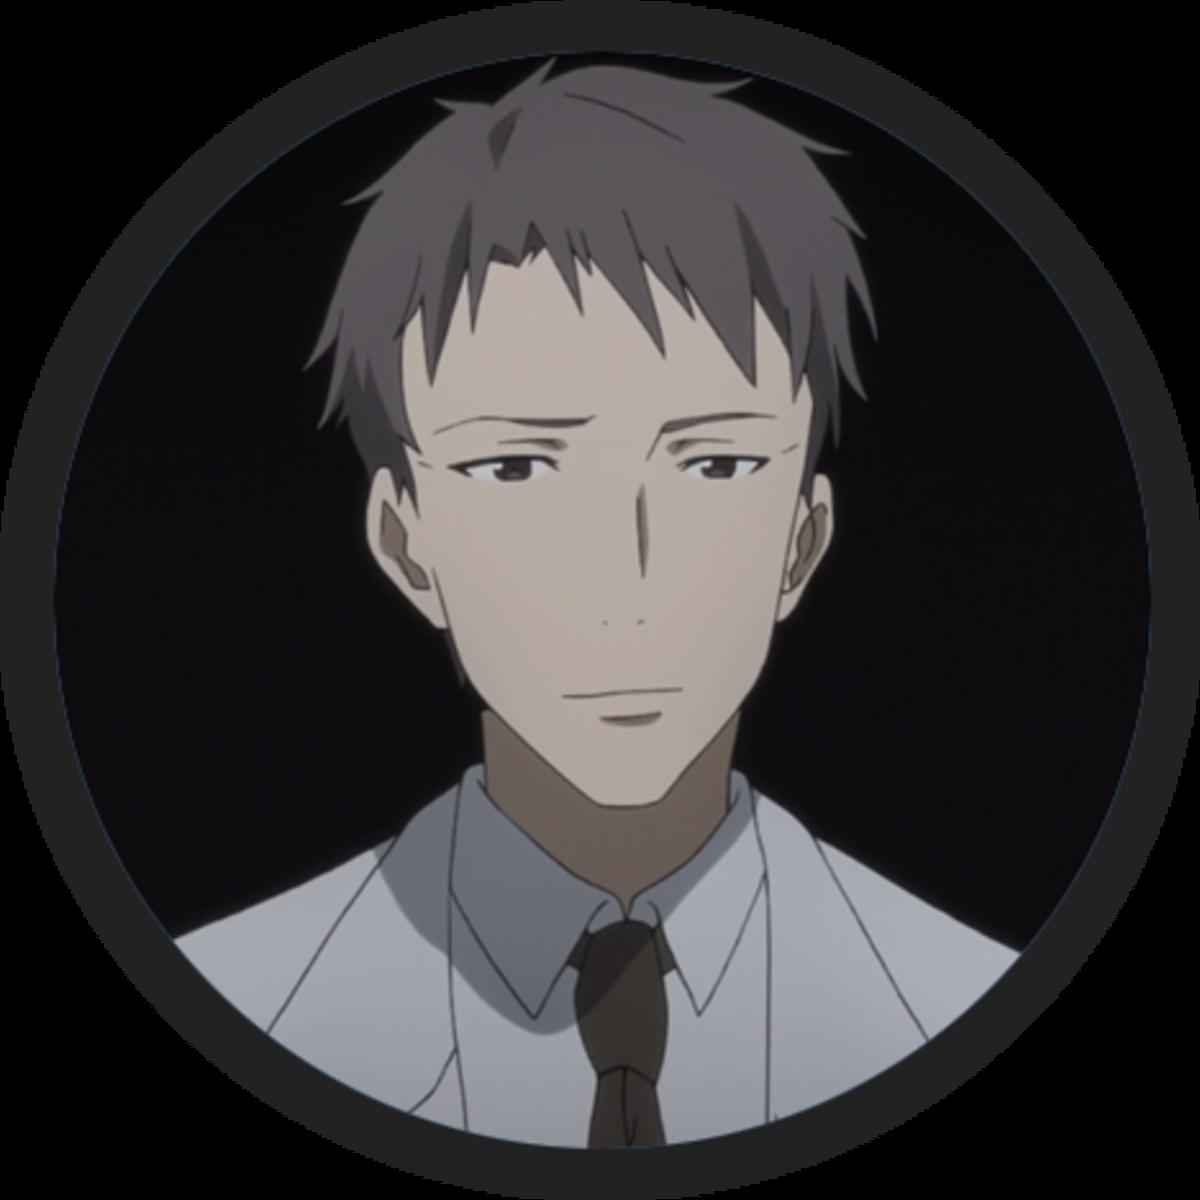 Kayaba Akihiko